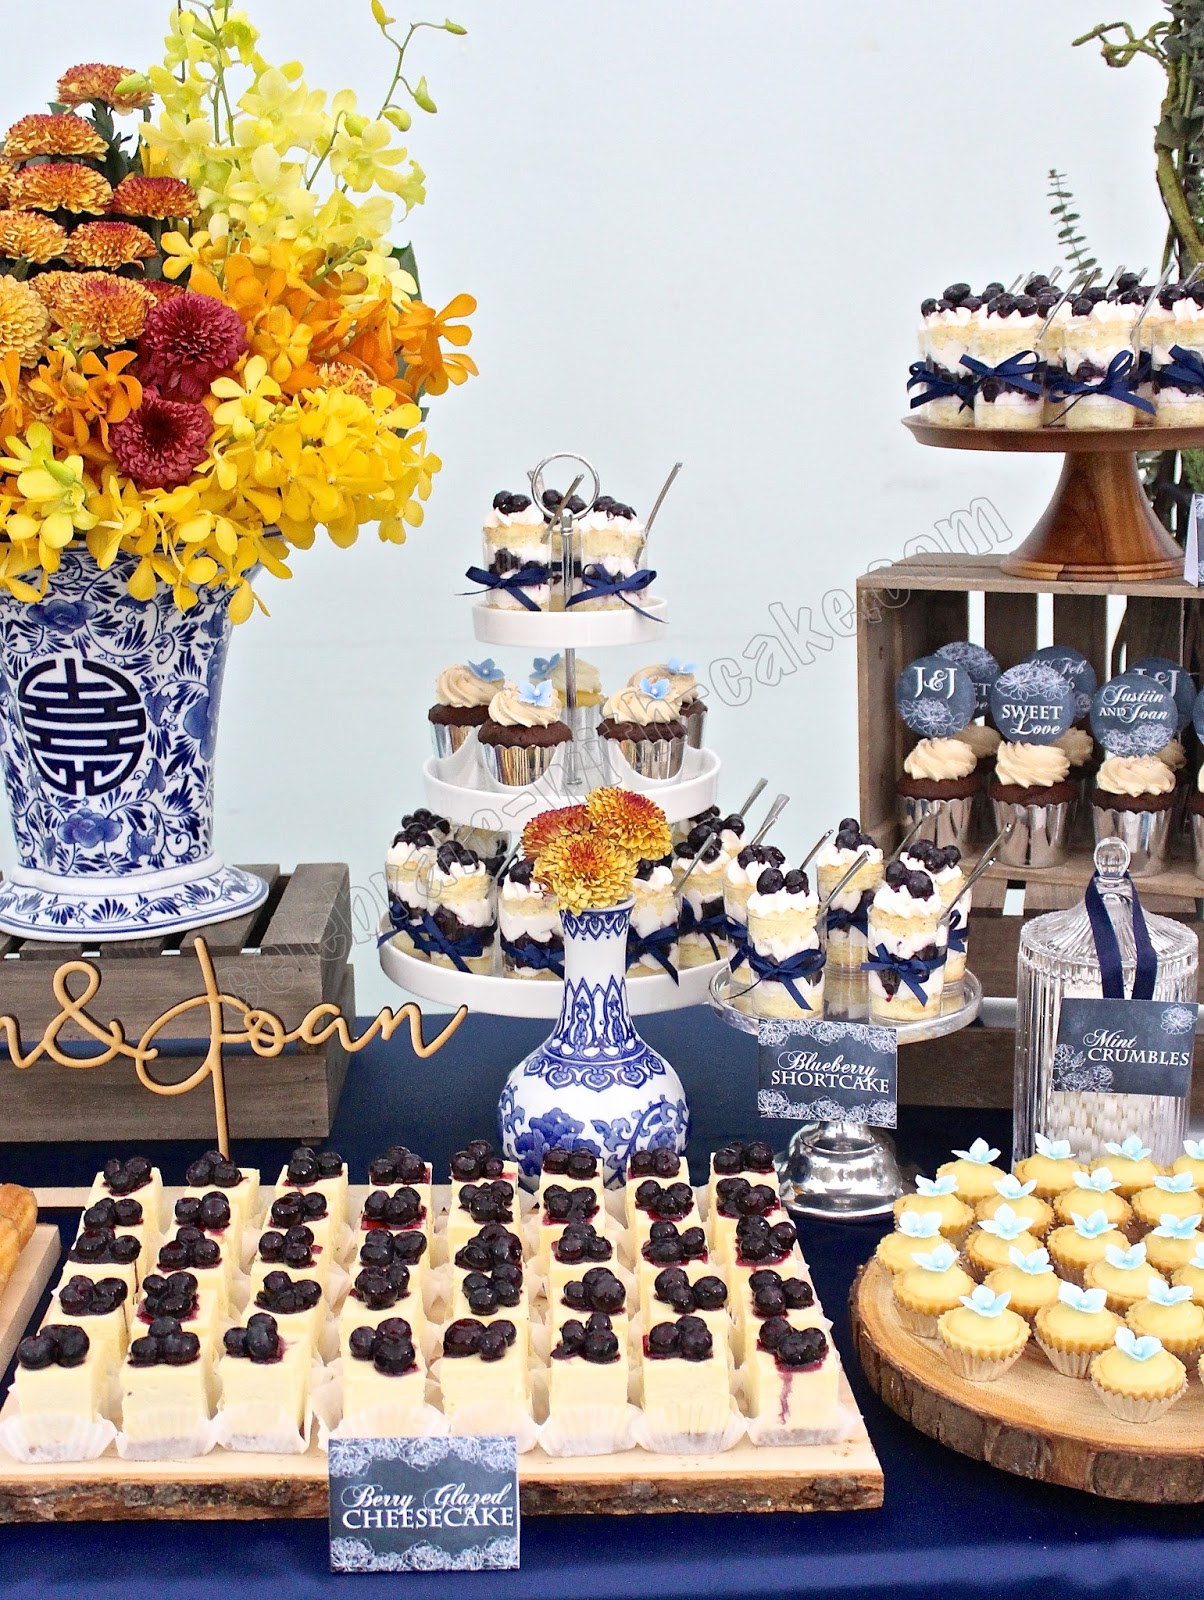 Wedding Dessert Trends | Arabia Weddings |Engagement Party Dessert Recipes